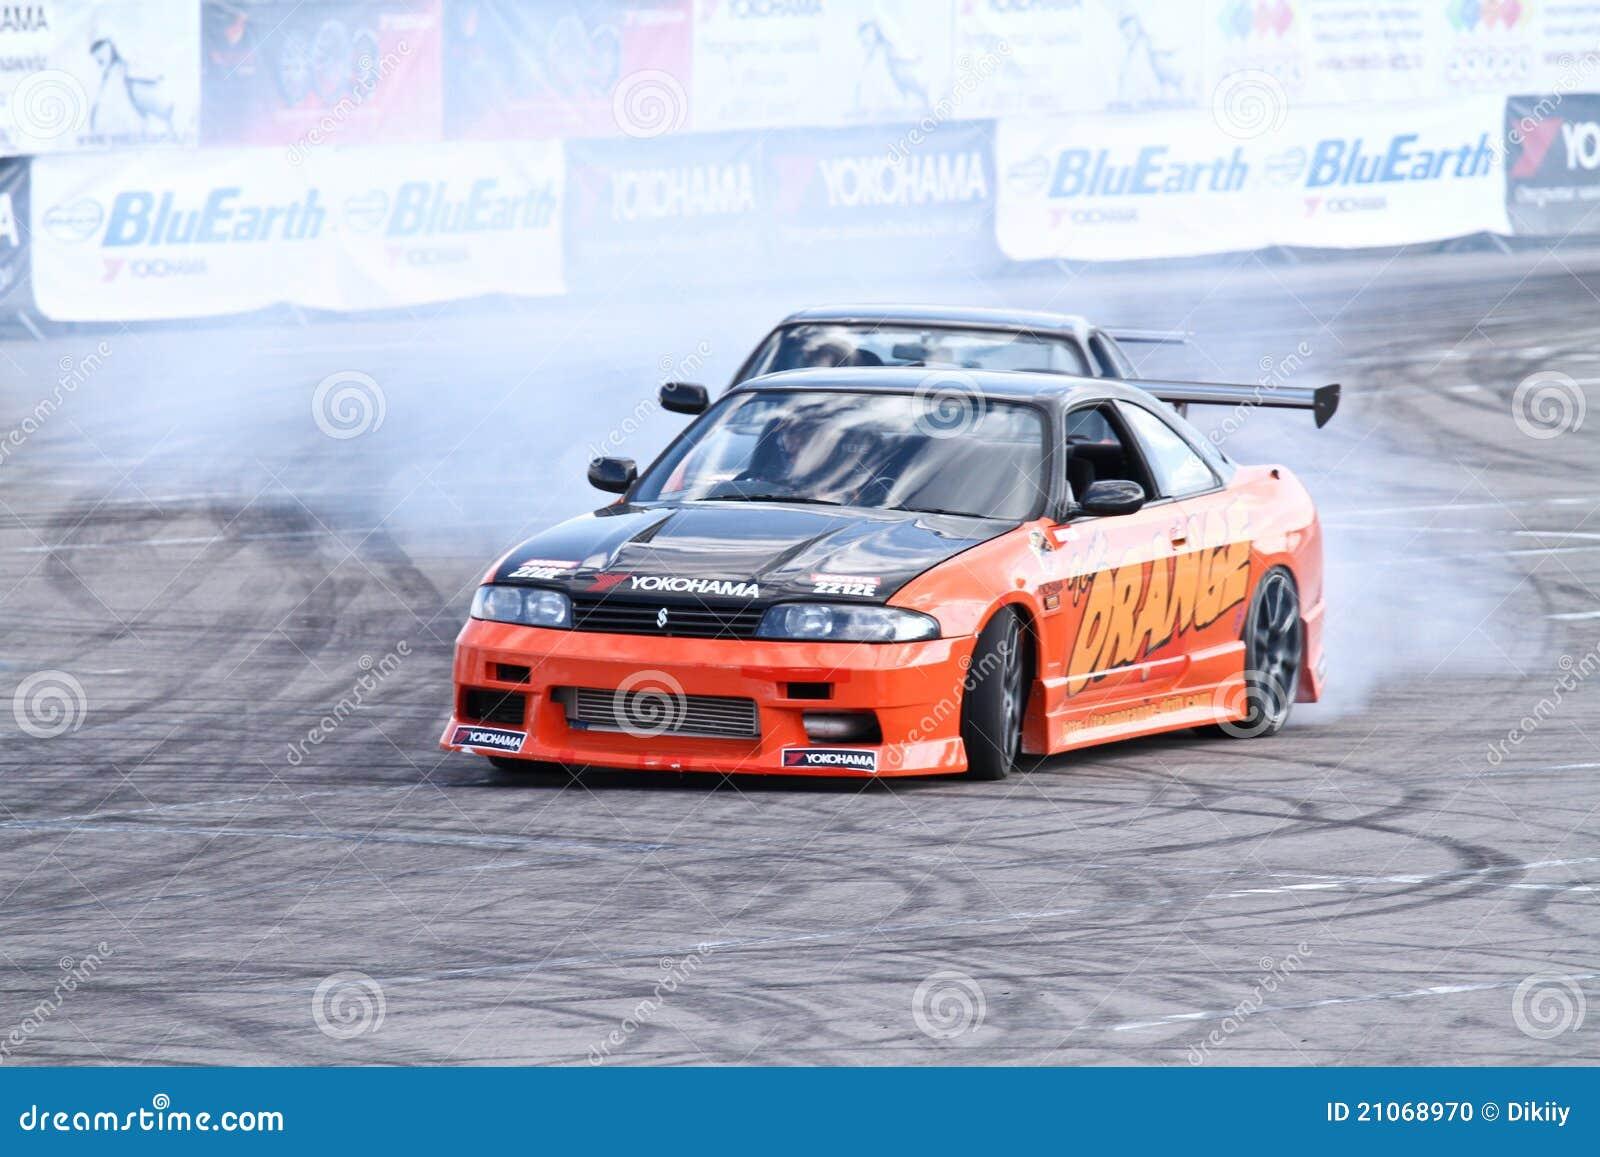 Drift show Orange team